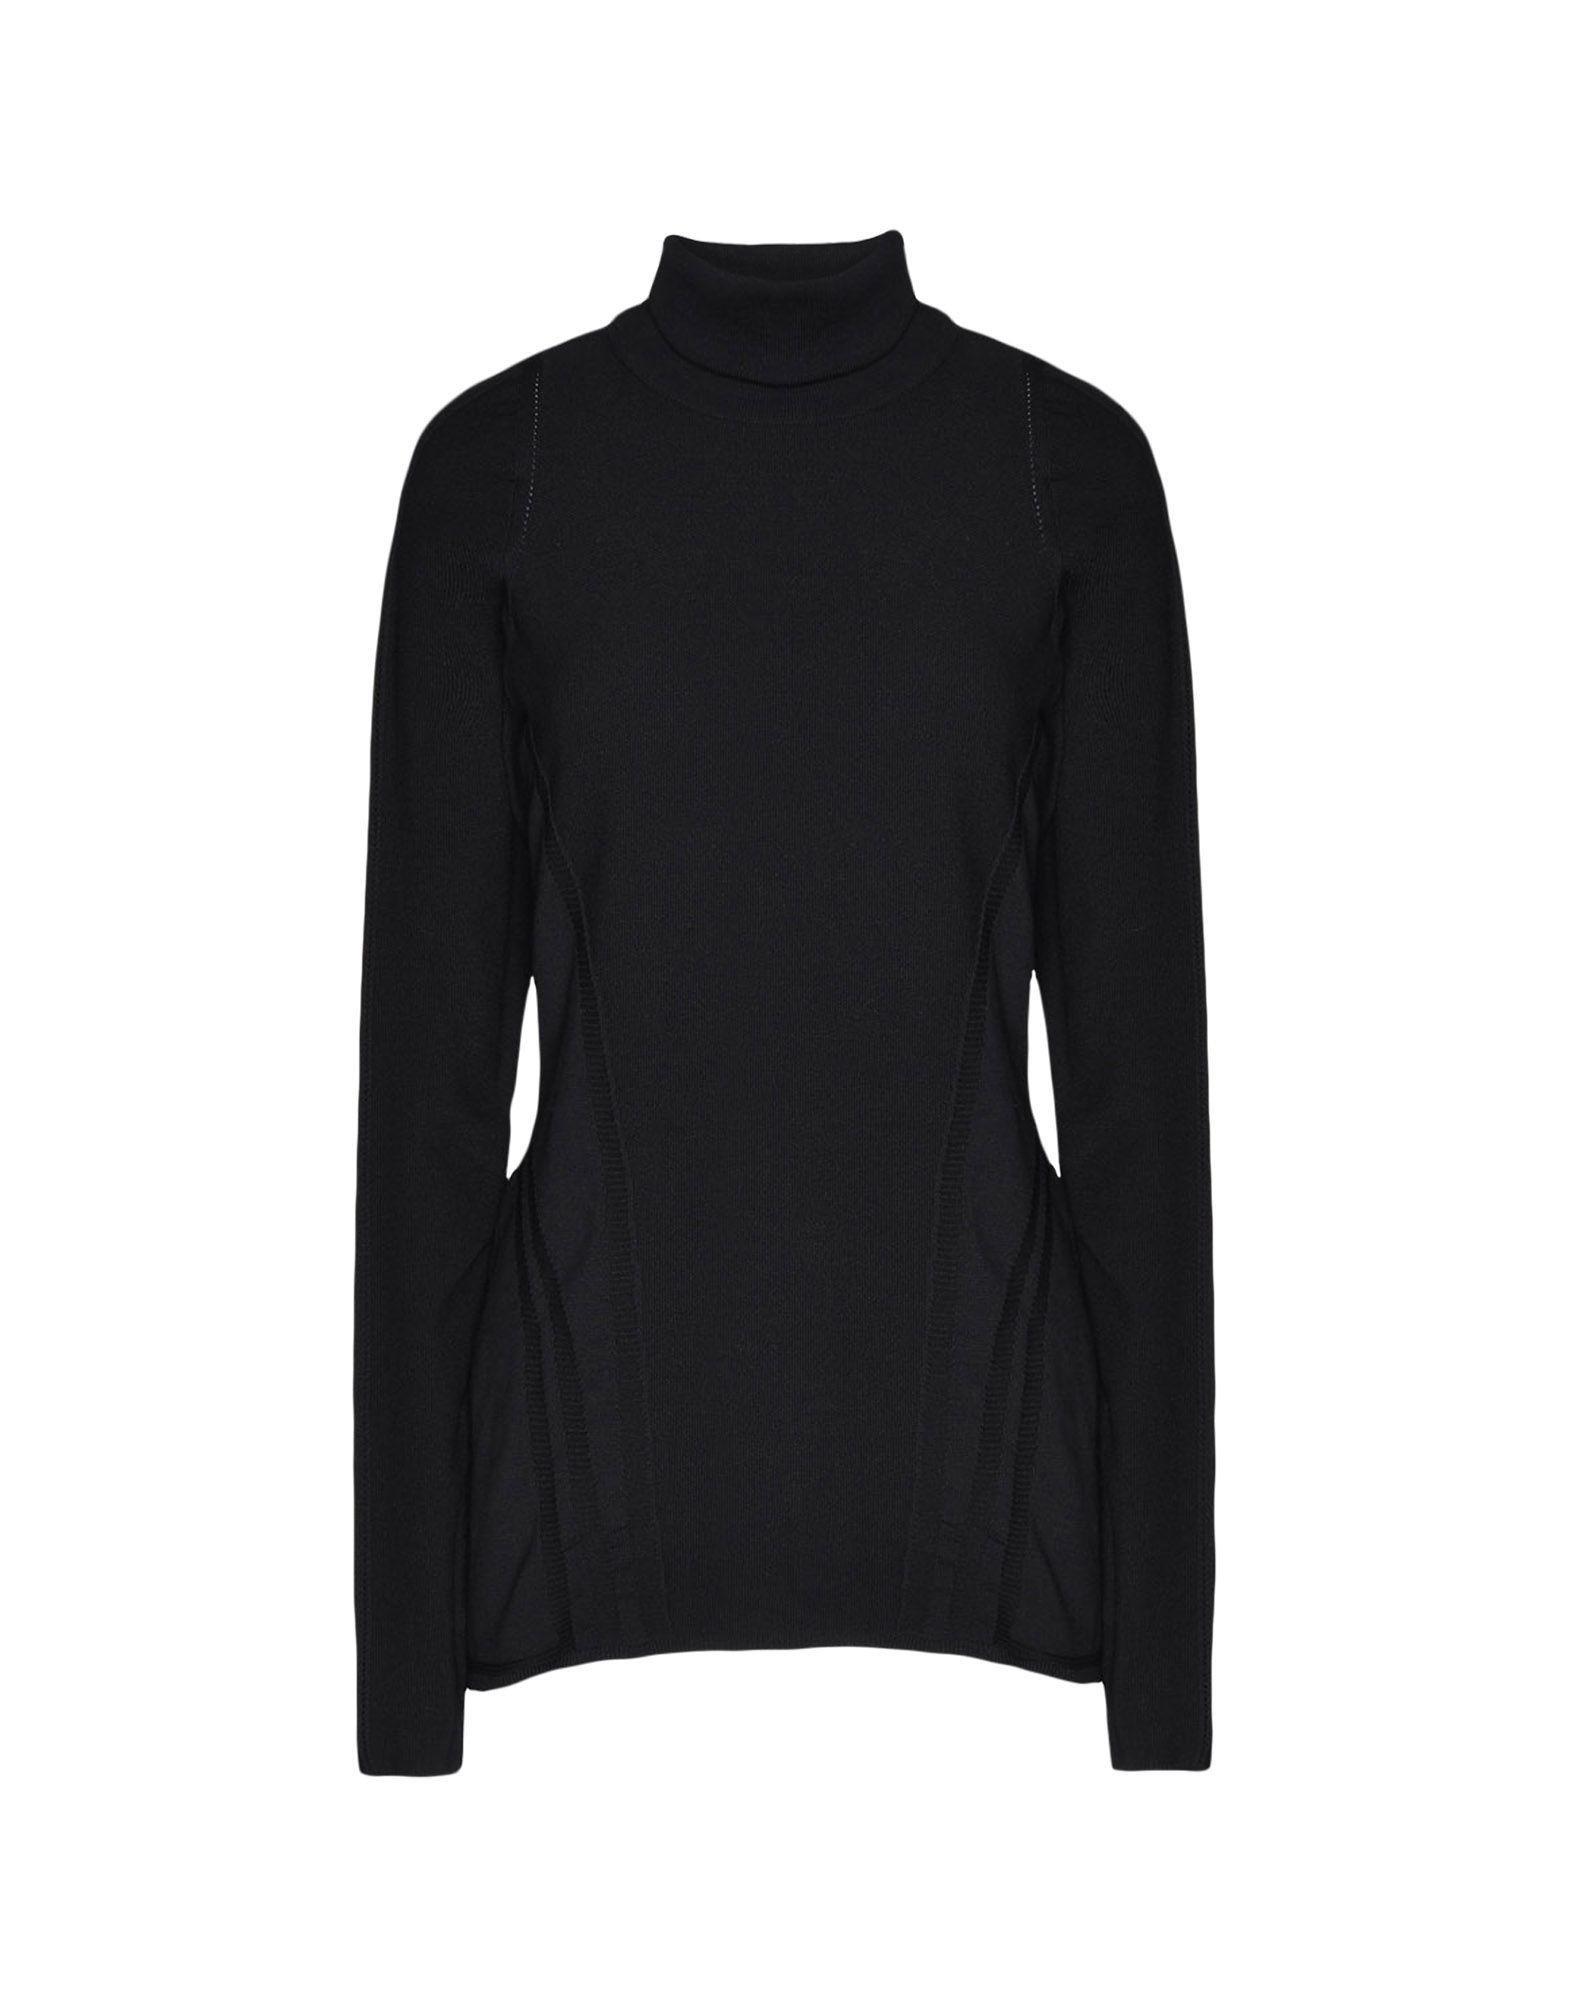 Y-3 Y-3 Tech Wool High Neck Tee Long sleeve t-shirt Woman f